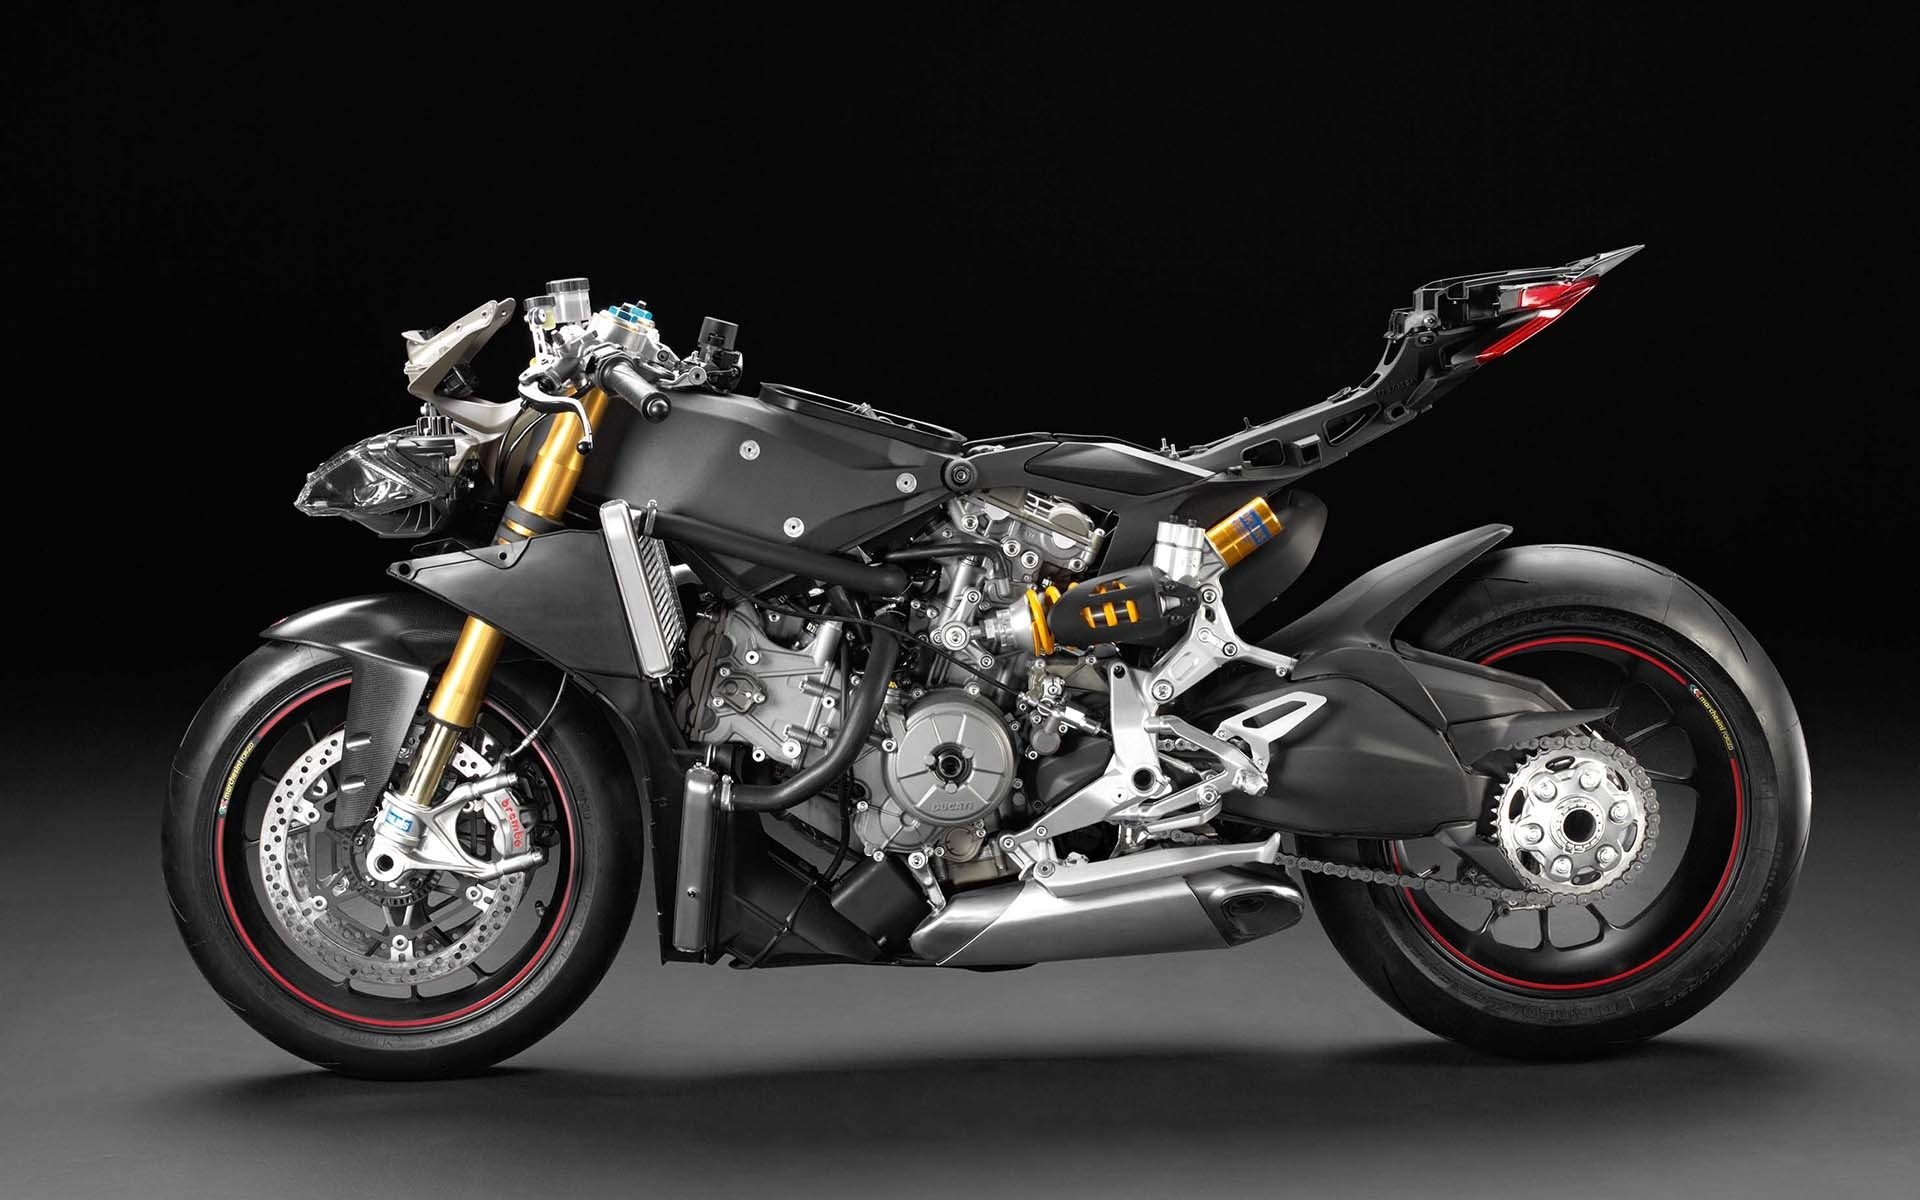 Ducati 1199 Panigale Motorcycle HD Wallpaper